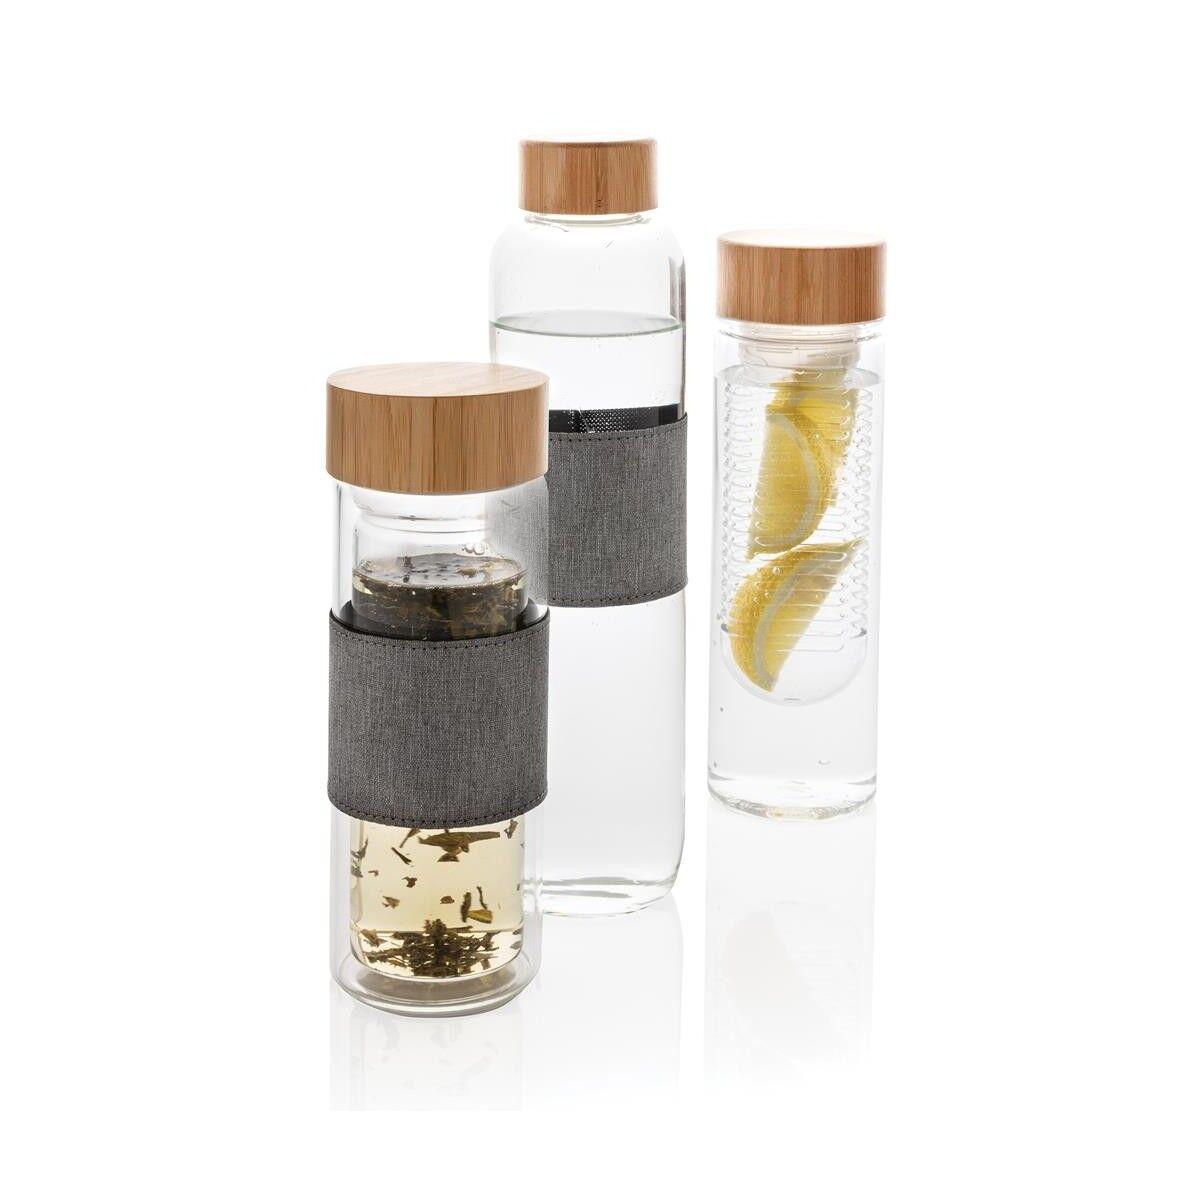 Bamboo lid Infuser Bottle